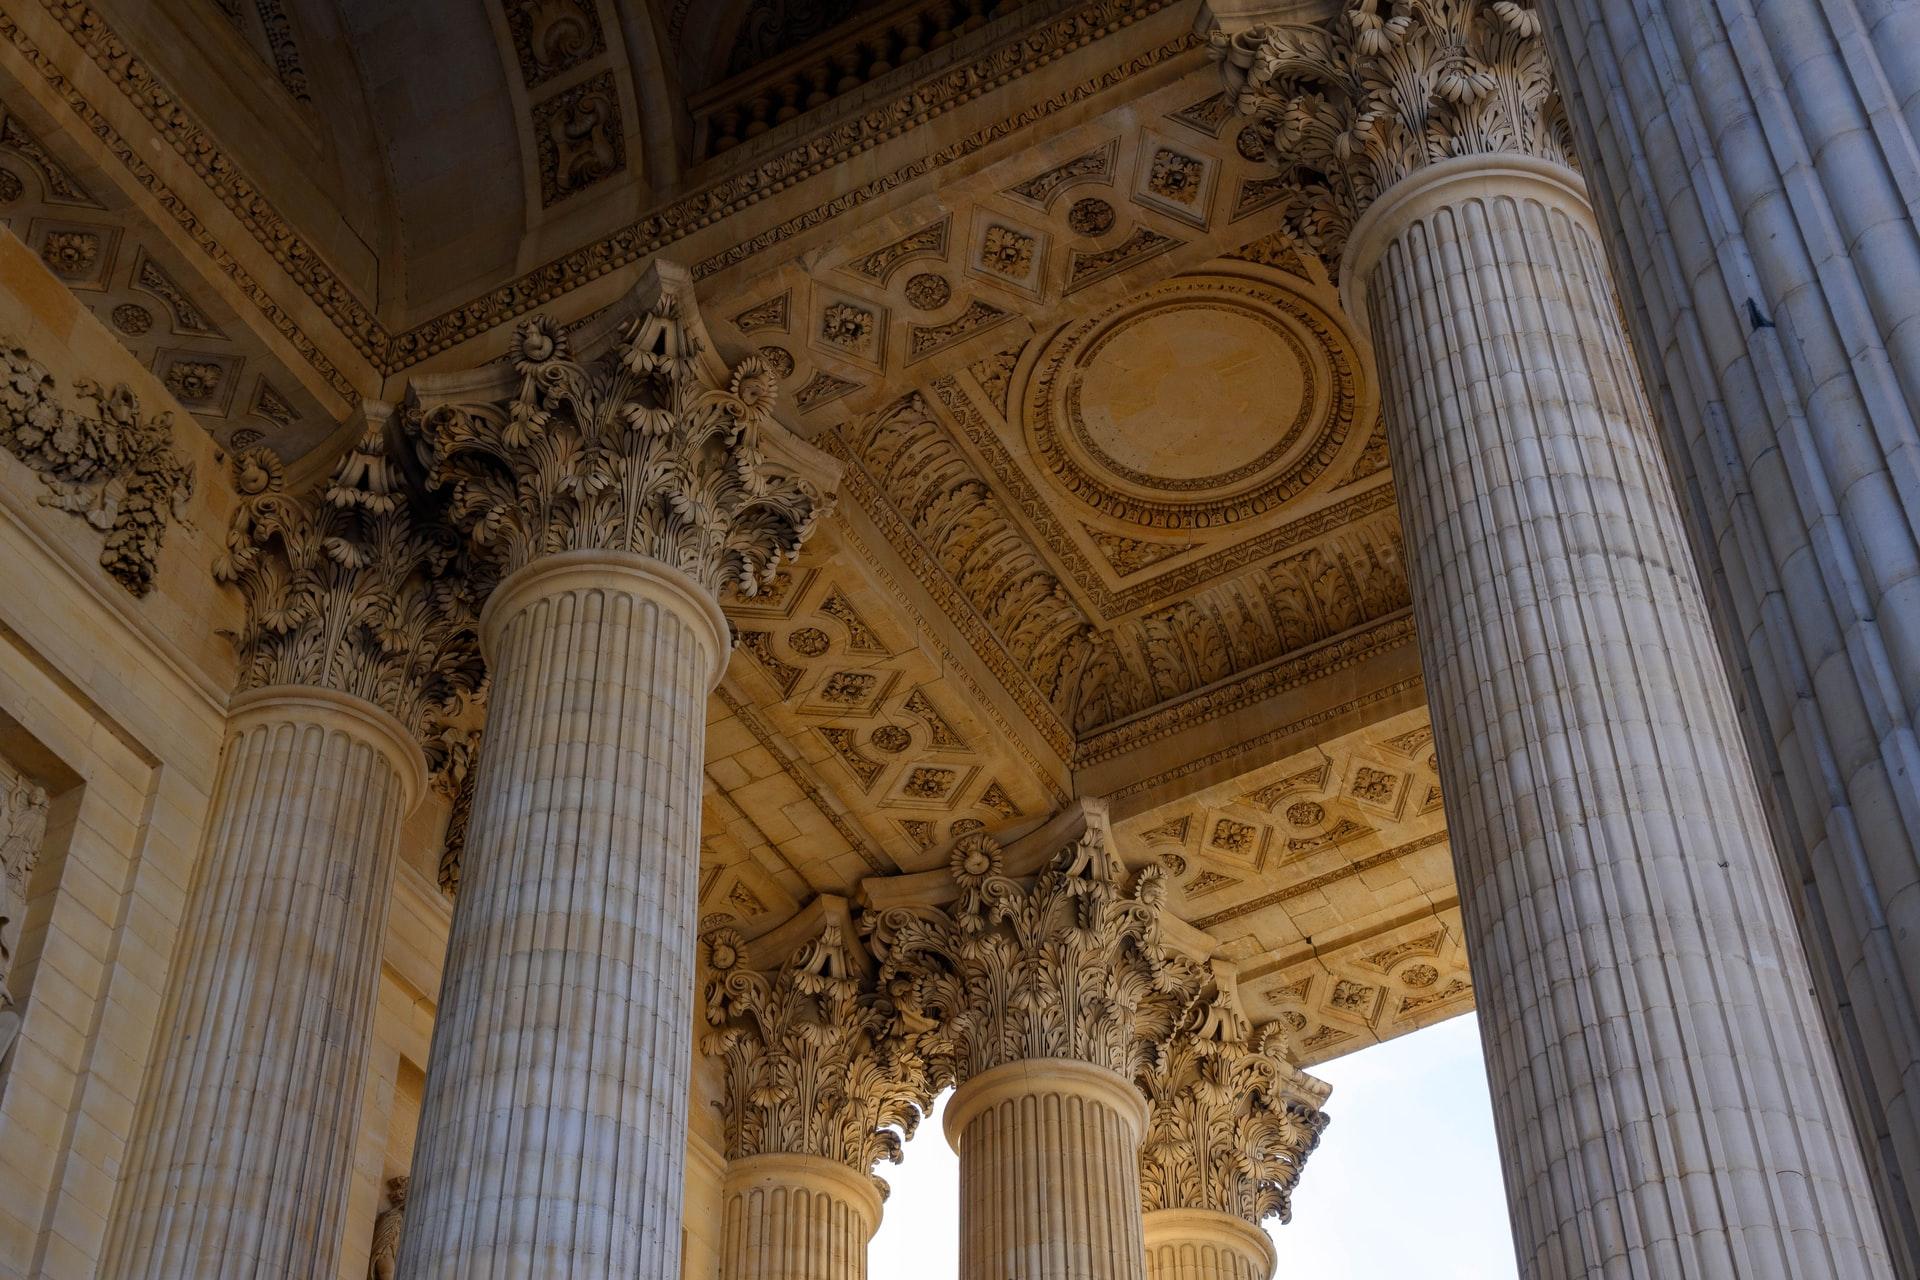 Interior columns in the Pantheon